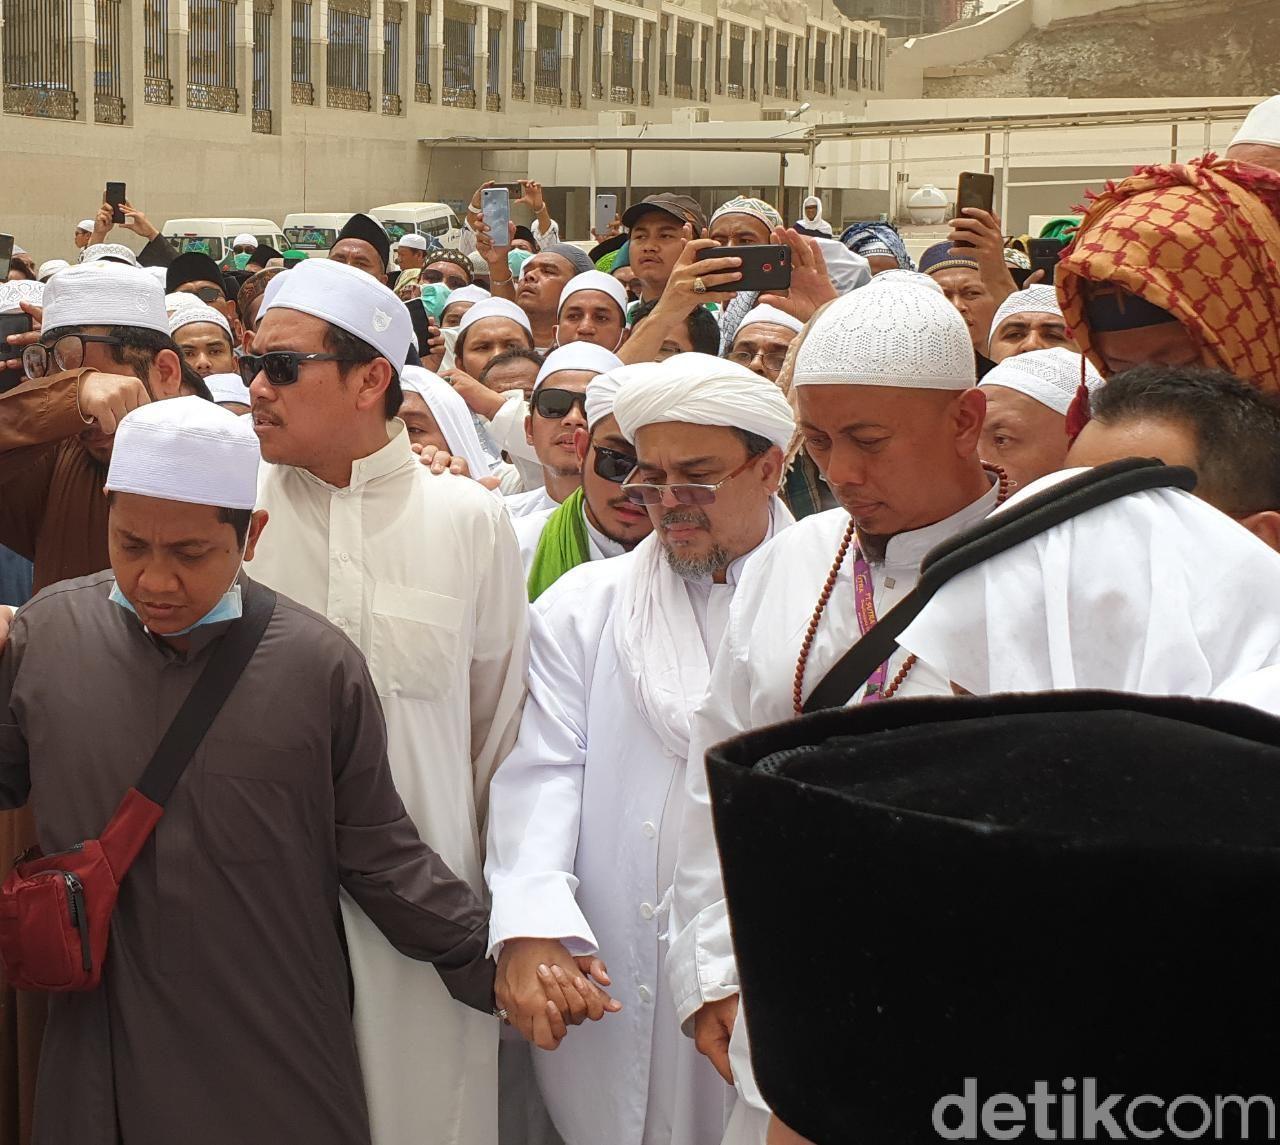 KH Maimun Zubair atau Mbah Moen telah dimakamkan di pemakaman Al Ma'la Mekah. Habib Rizieq Syihab turut menyaksikan pemakaman kiai karismatik itu.